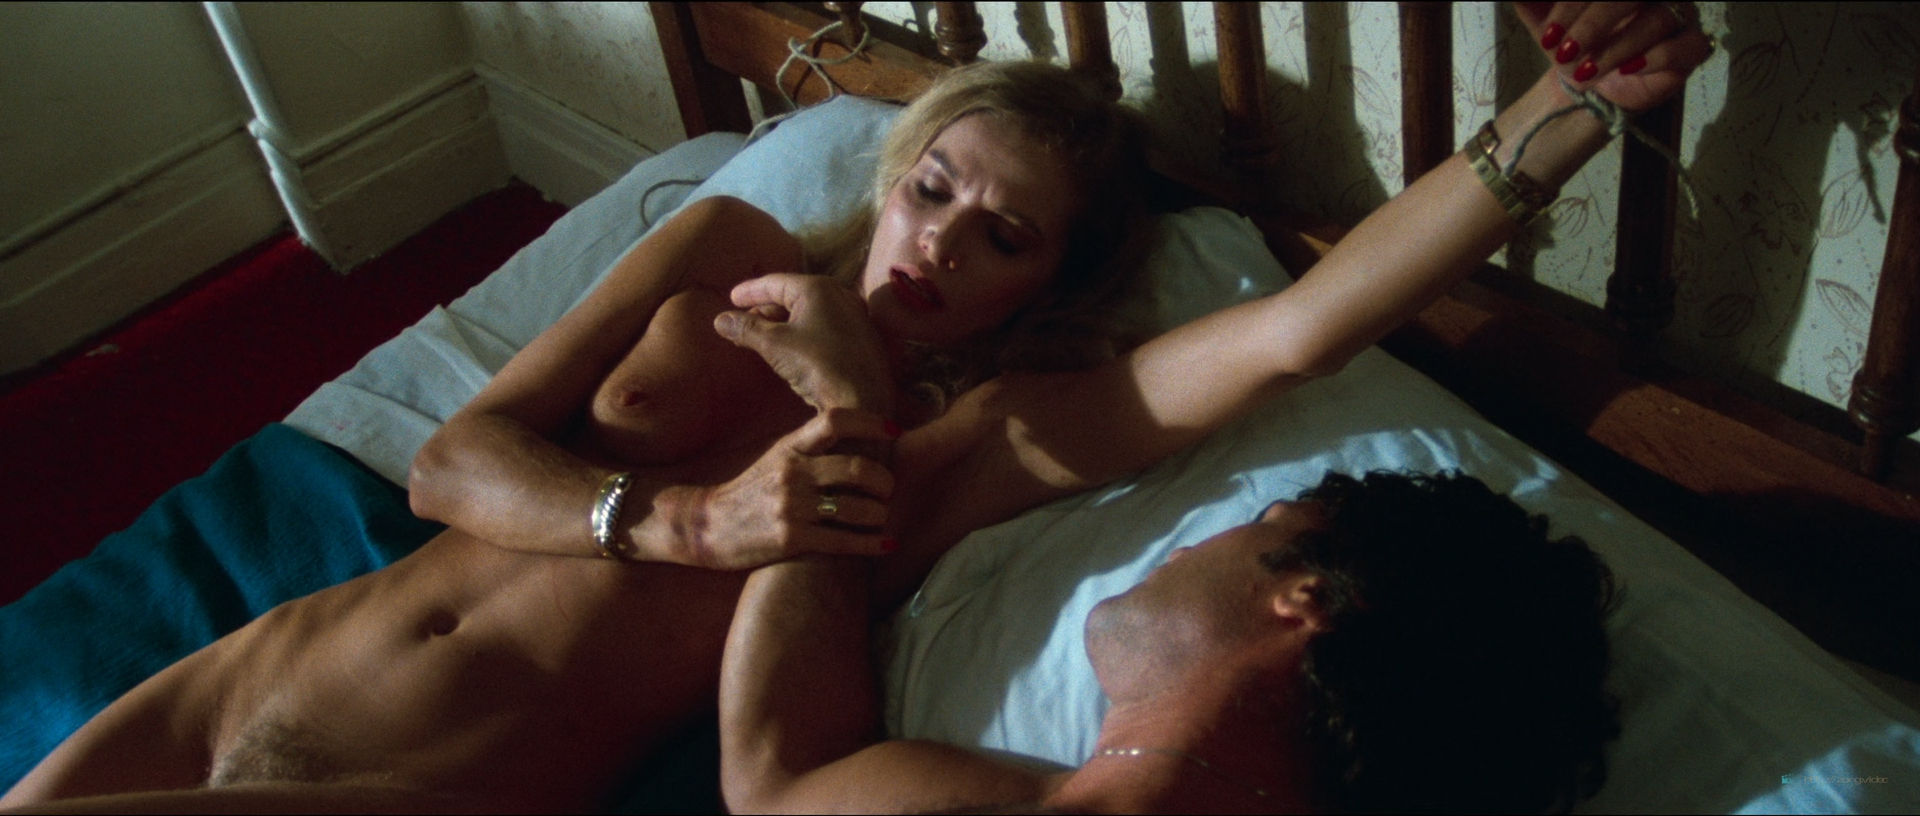 Daniela Doria nude full frontal Zora Kerova and other nude - The New York Ripper (IT-1982) HD 1080p BluRay(r) (4)